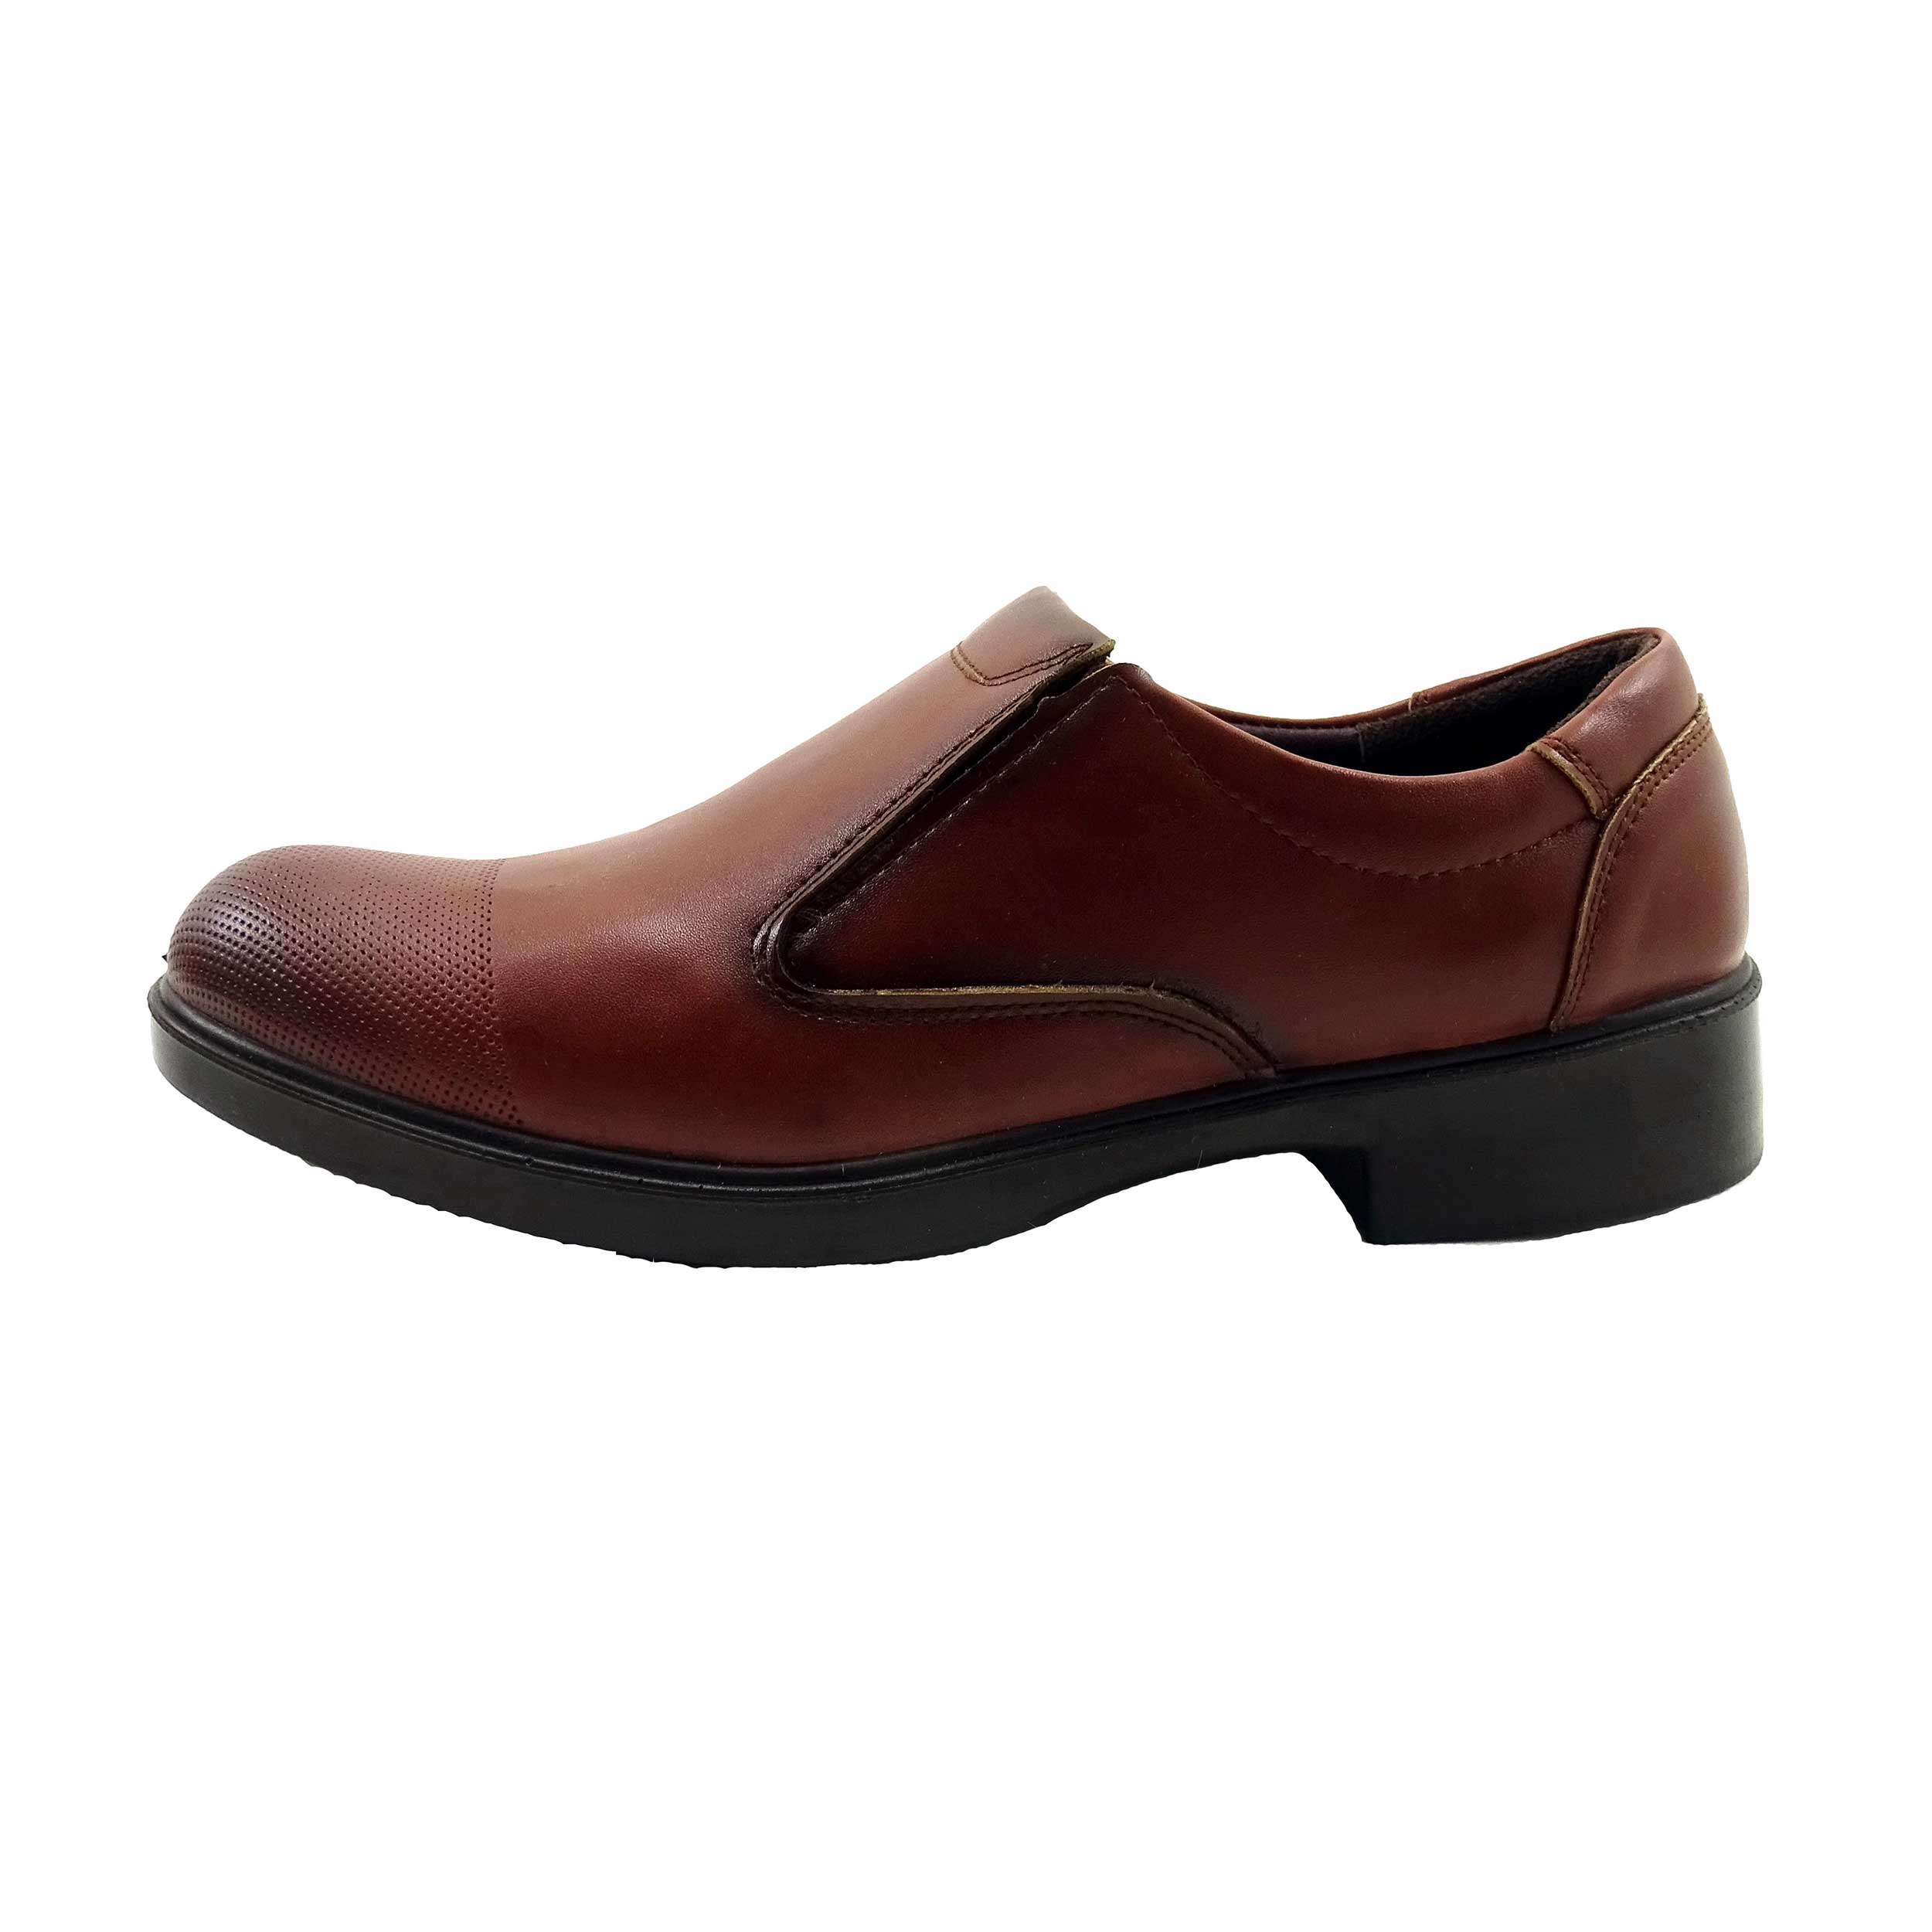 قیمت کفش مردانه آذاردو مدل M00104